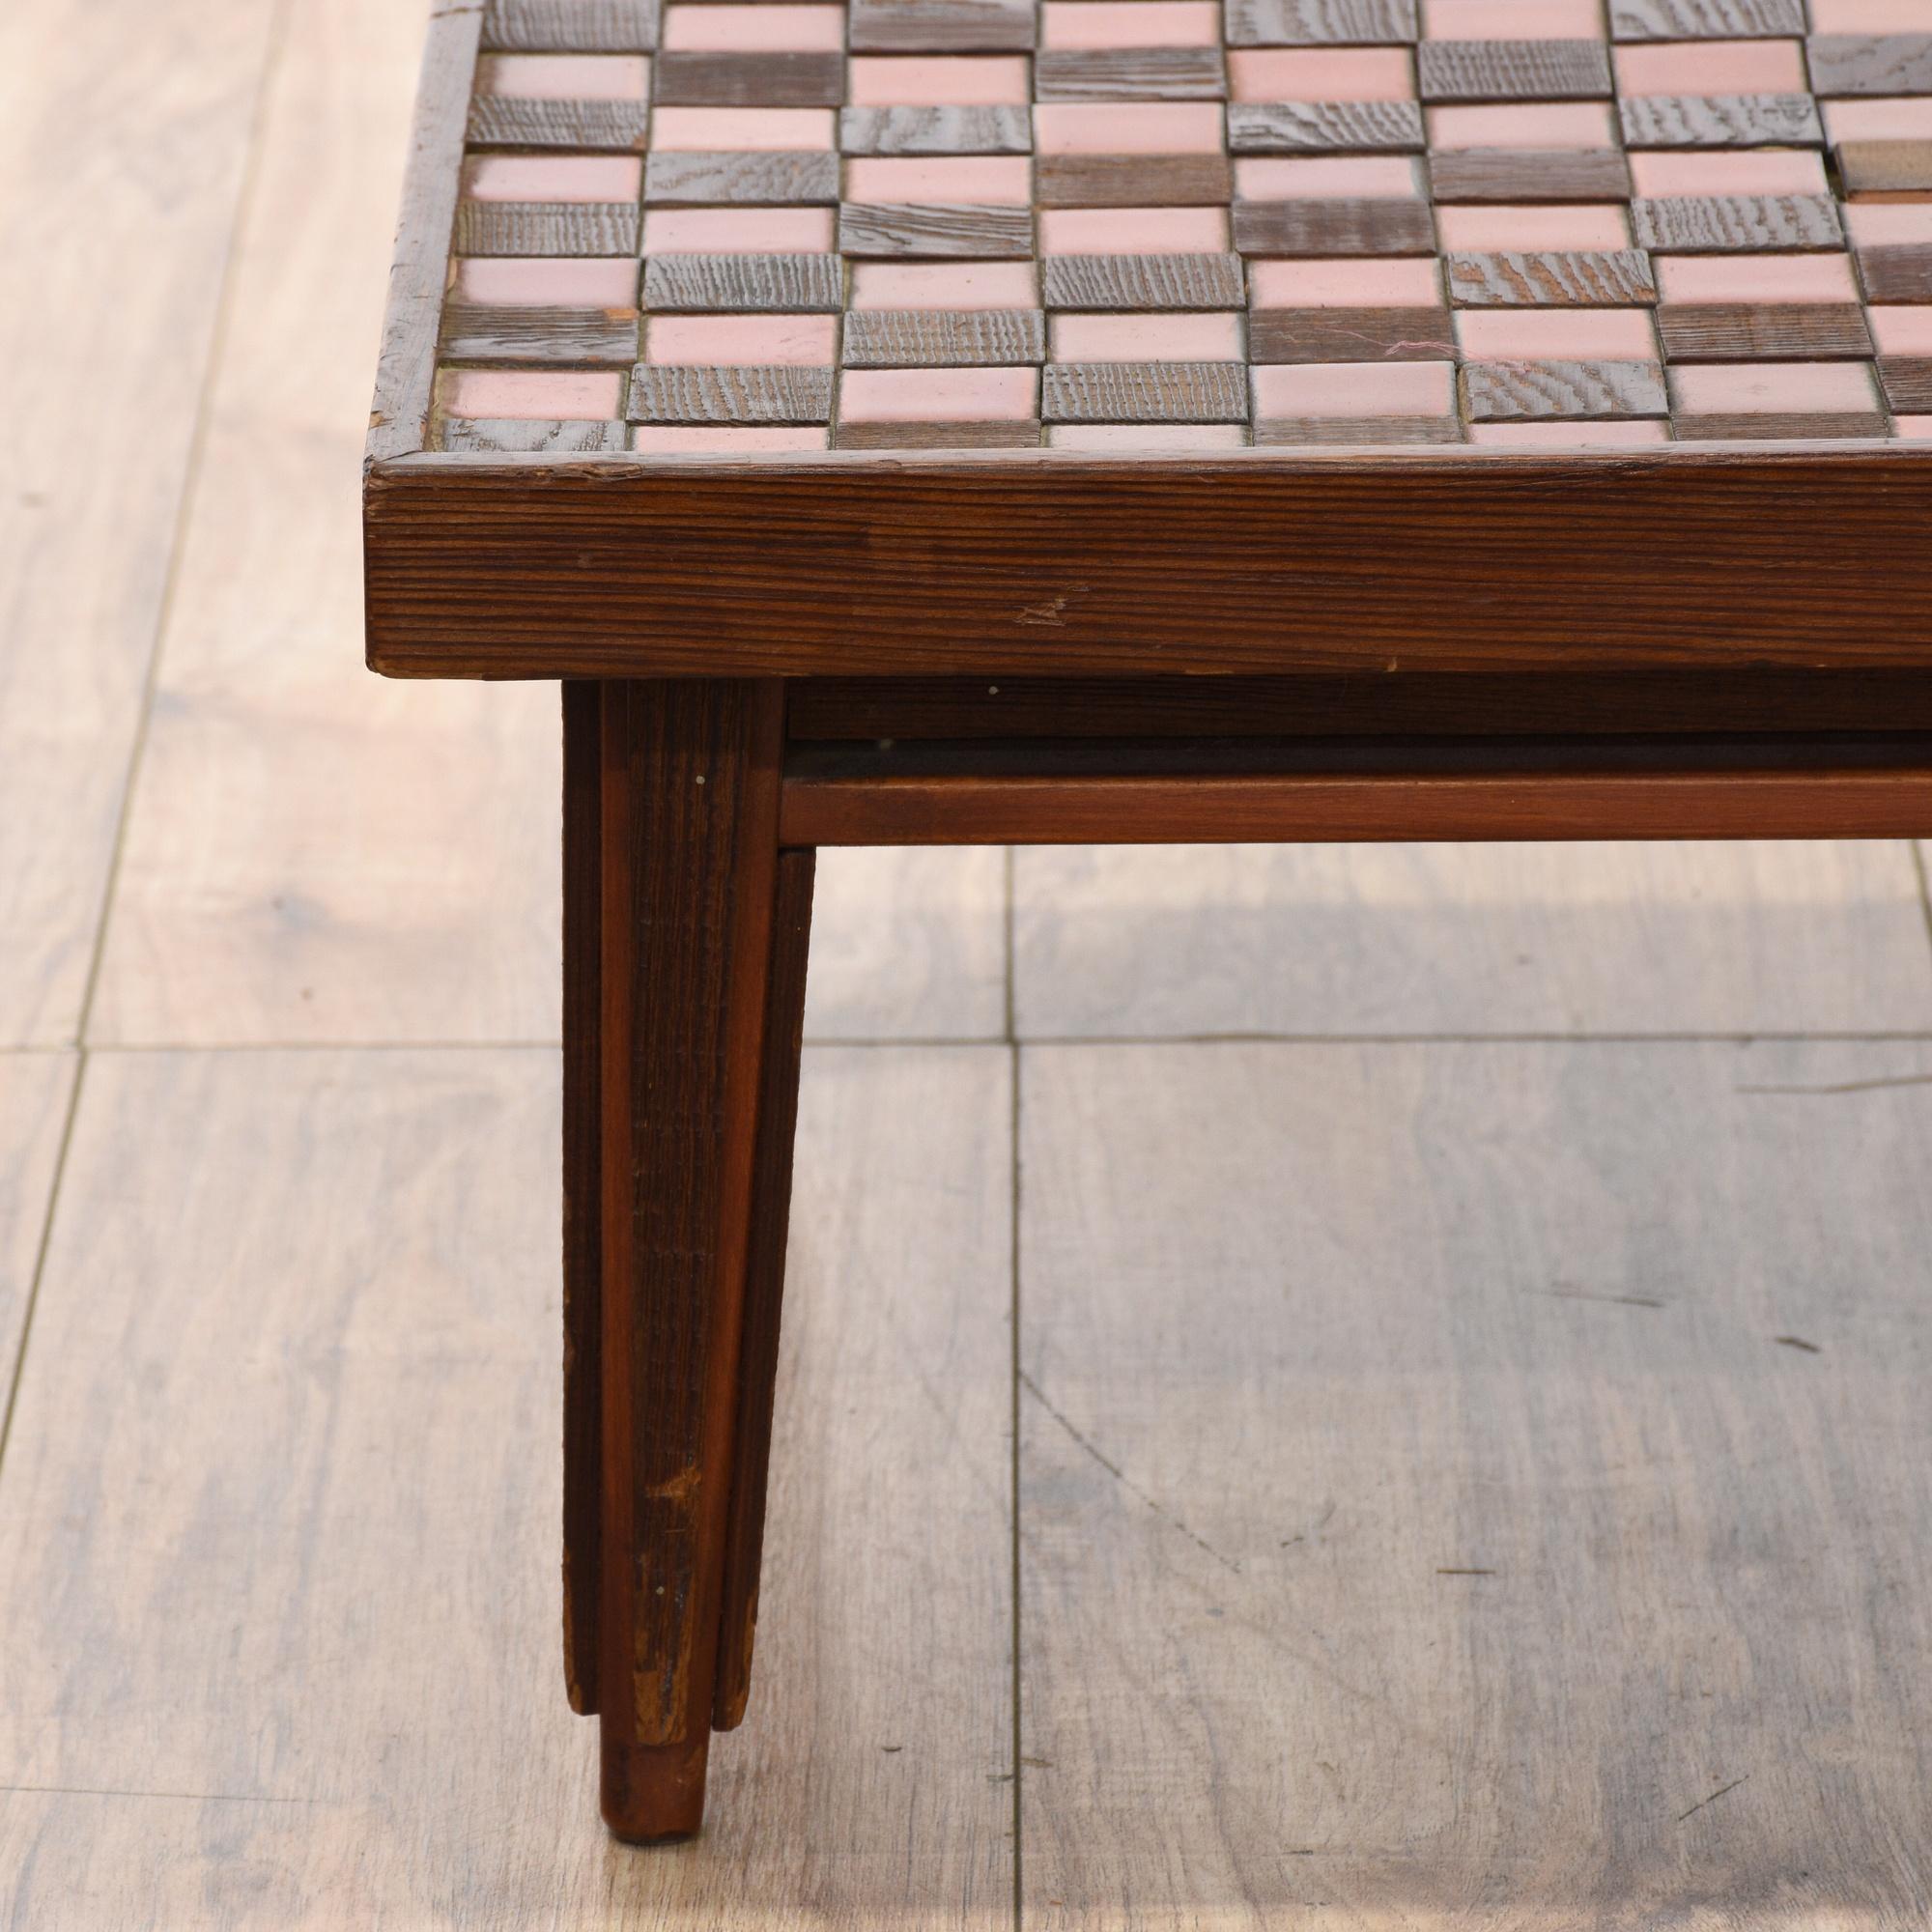 Tile & Wood Mosaic Top Coffee Table